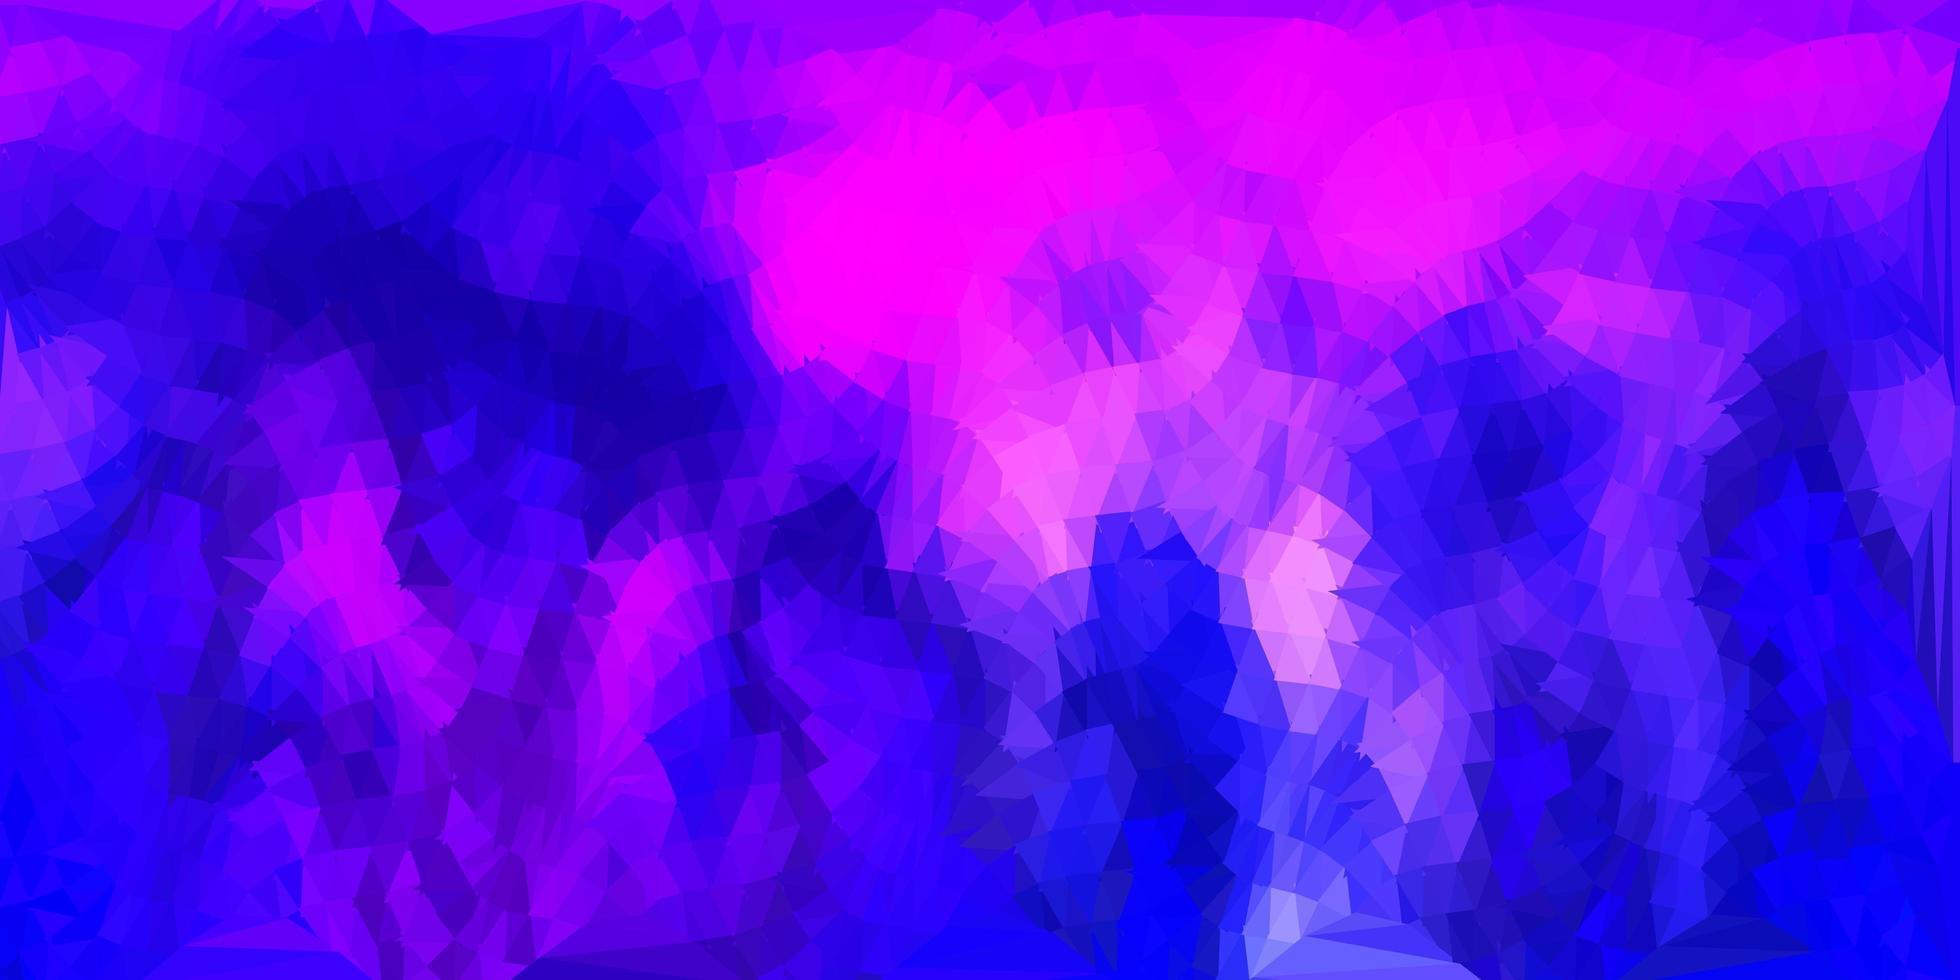 geometrisches polygonales Design des dunkelvioletten, rosa Vektors. vektor